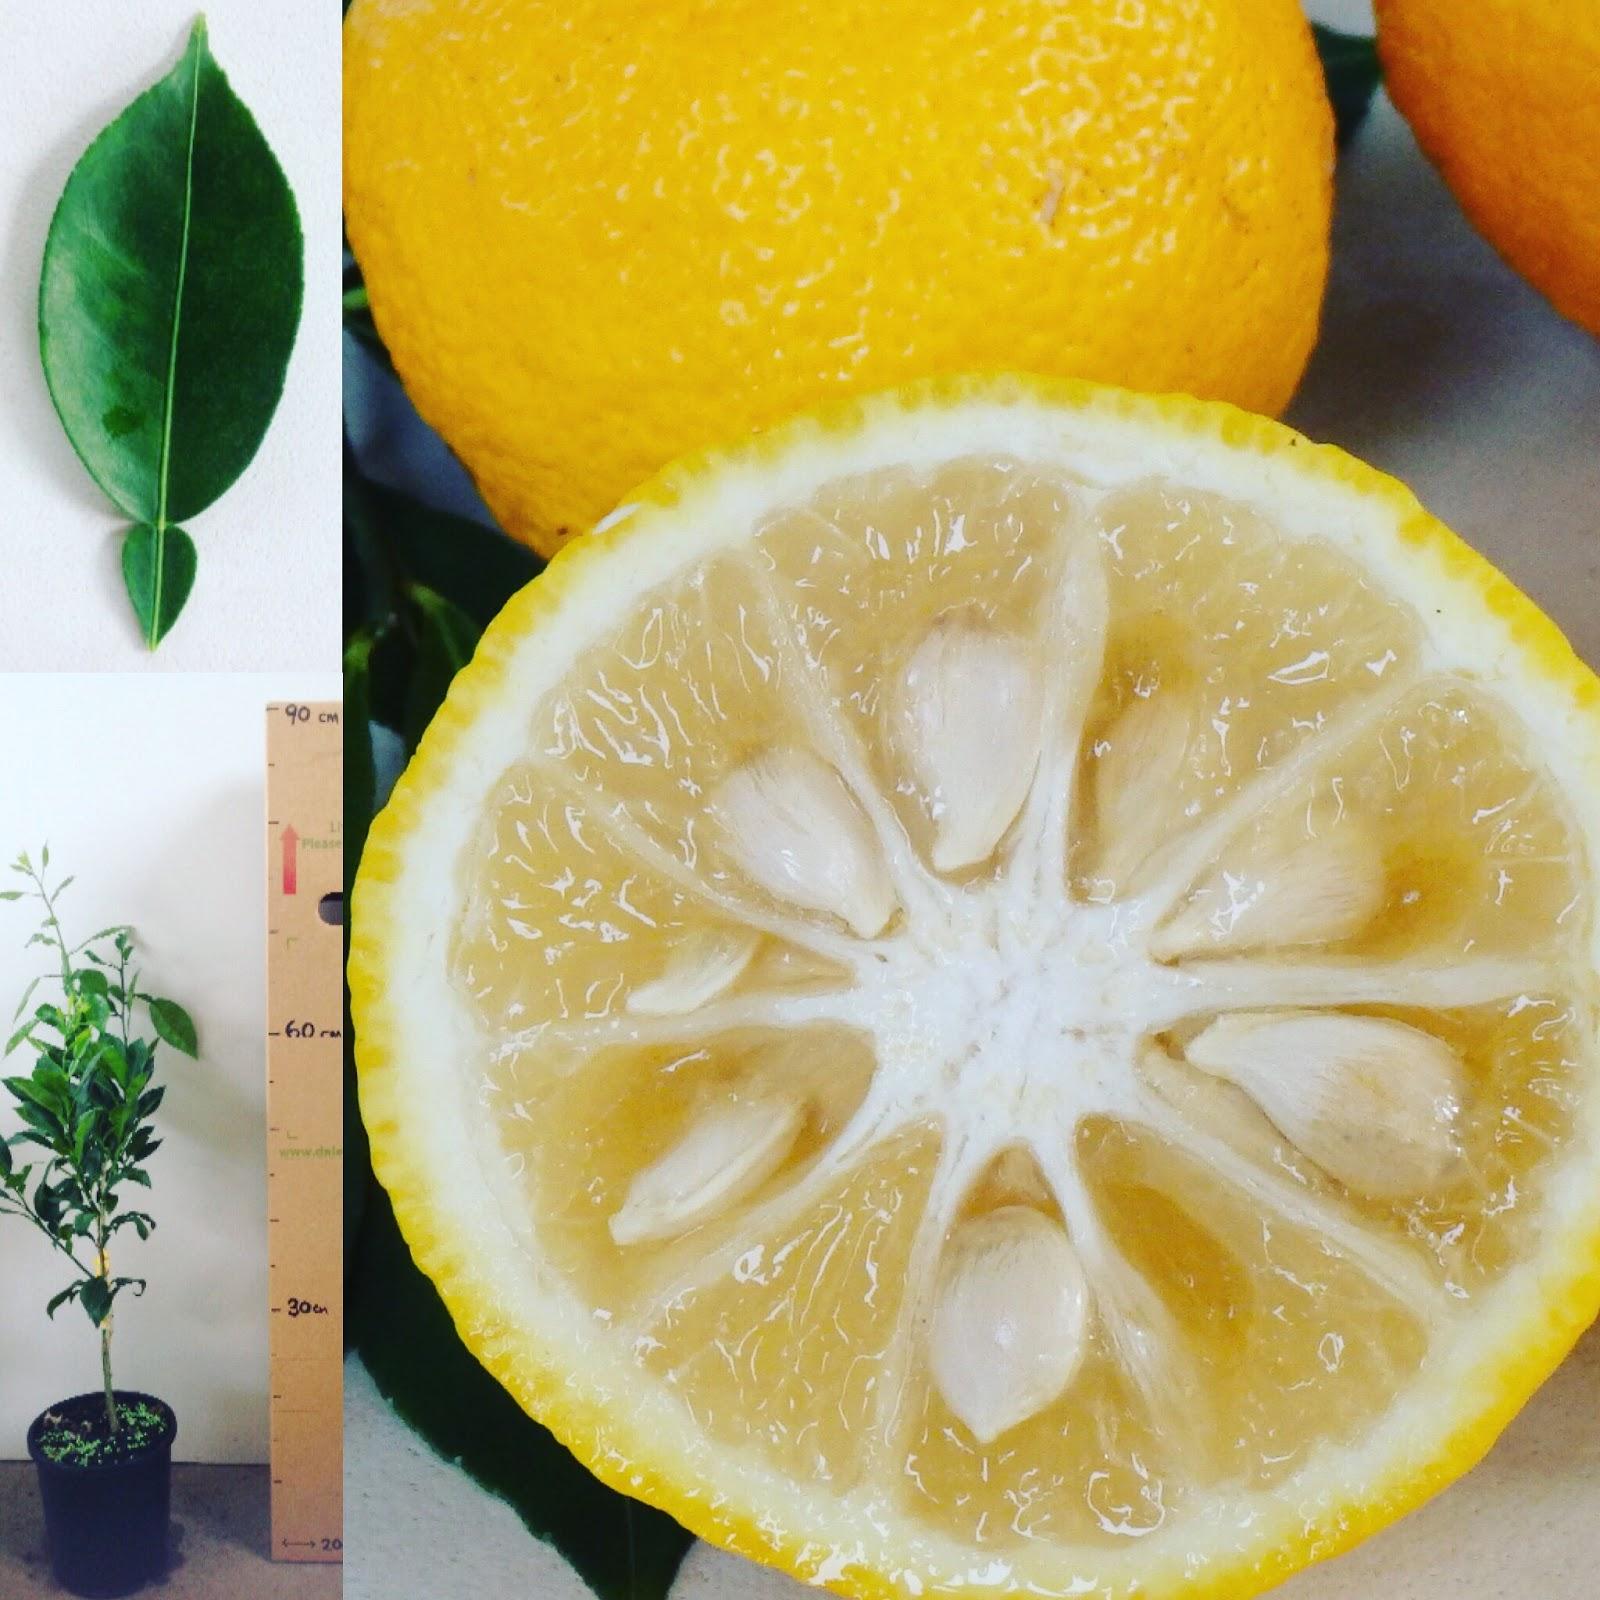 Daleys Fruit Tree Blog: Grafted Yuzu Fruit Trees - Cooking ...